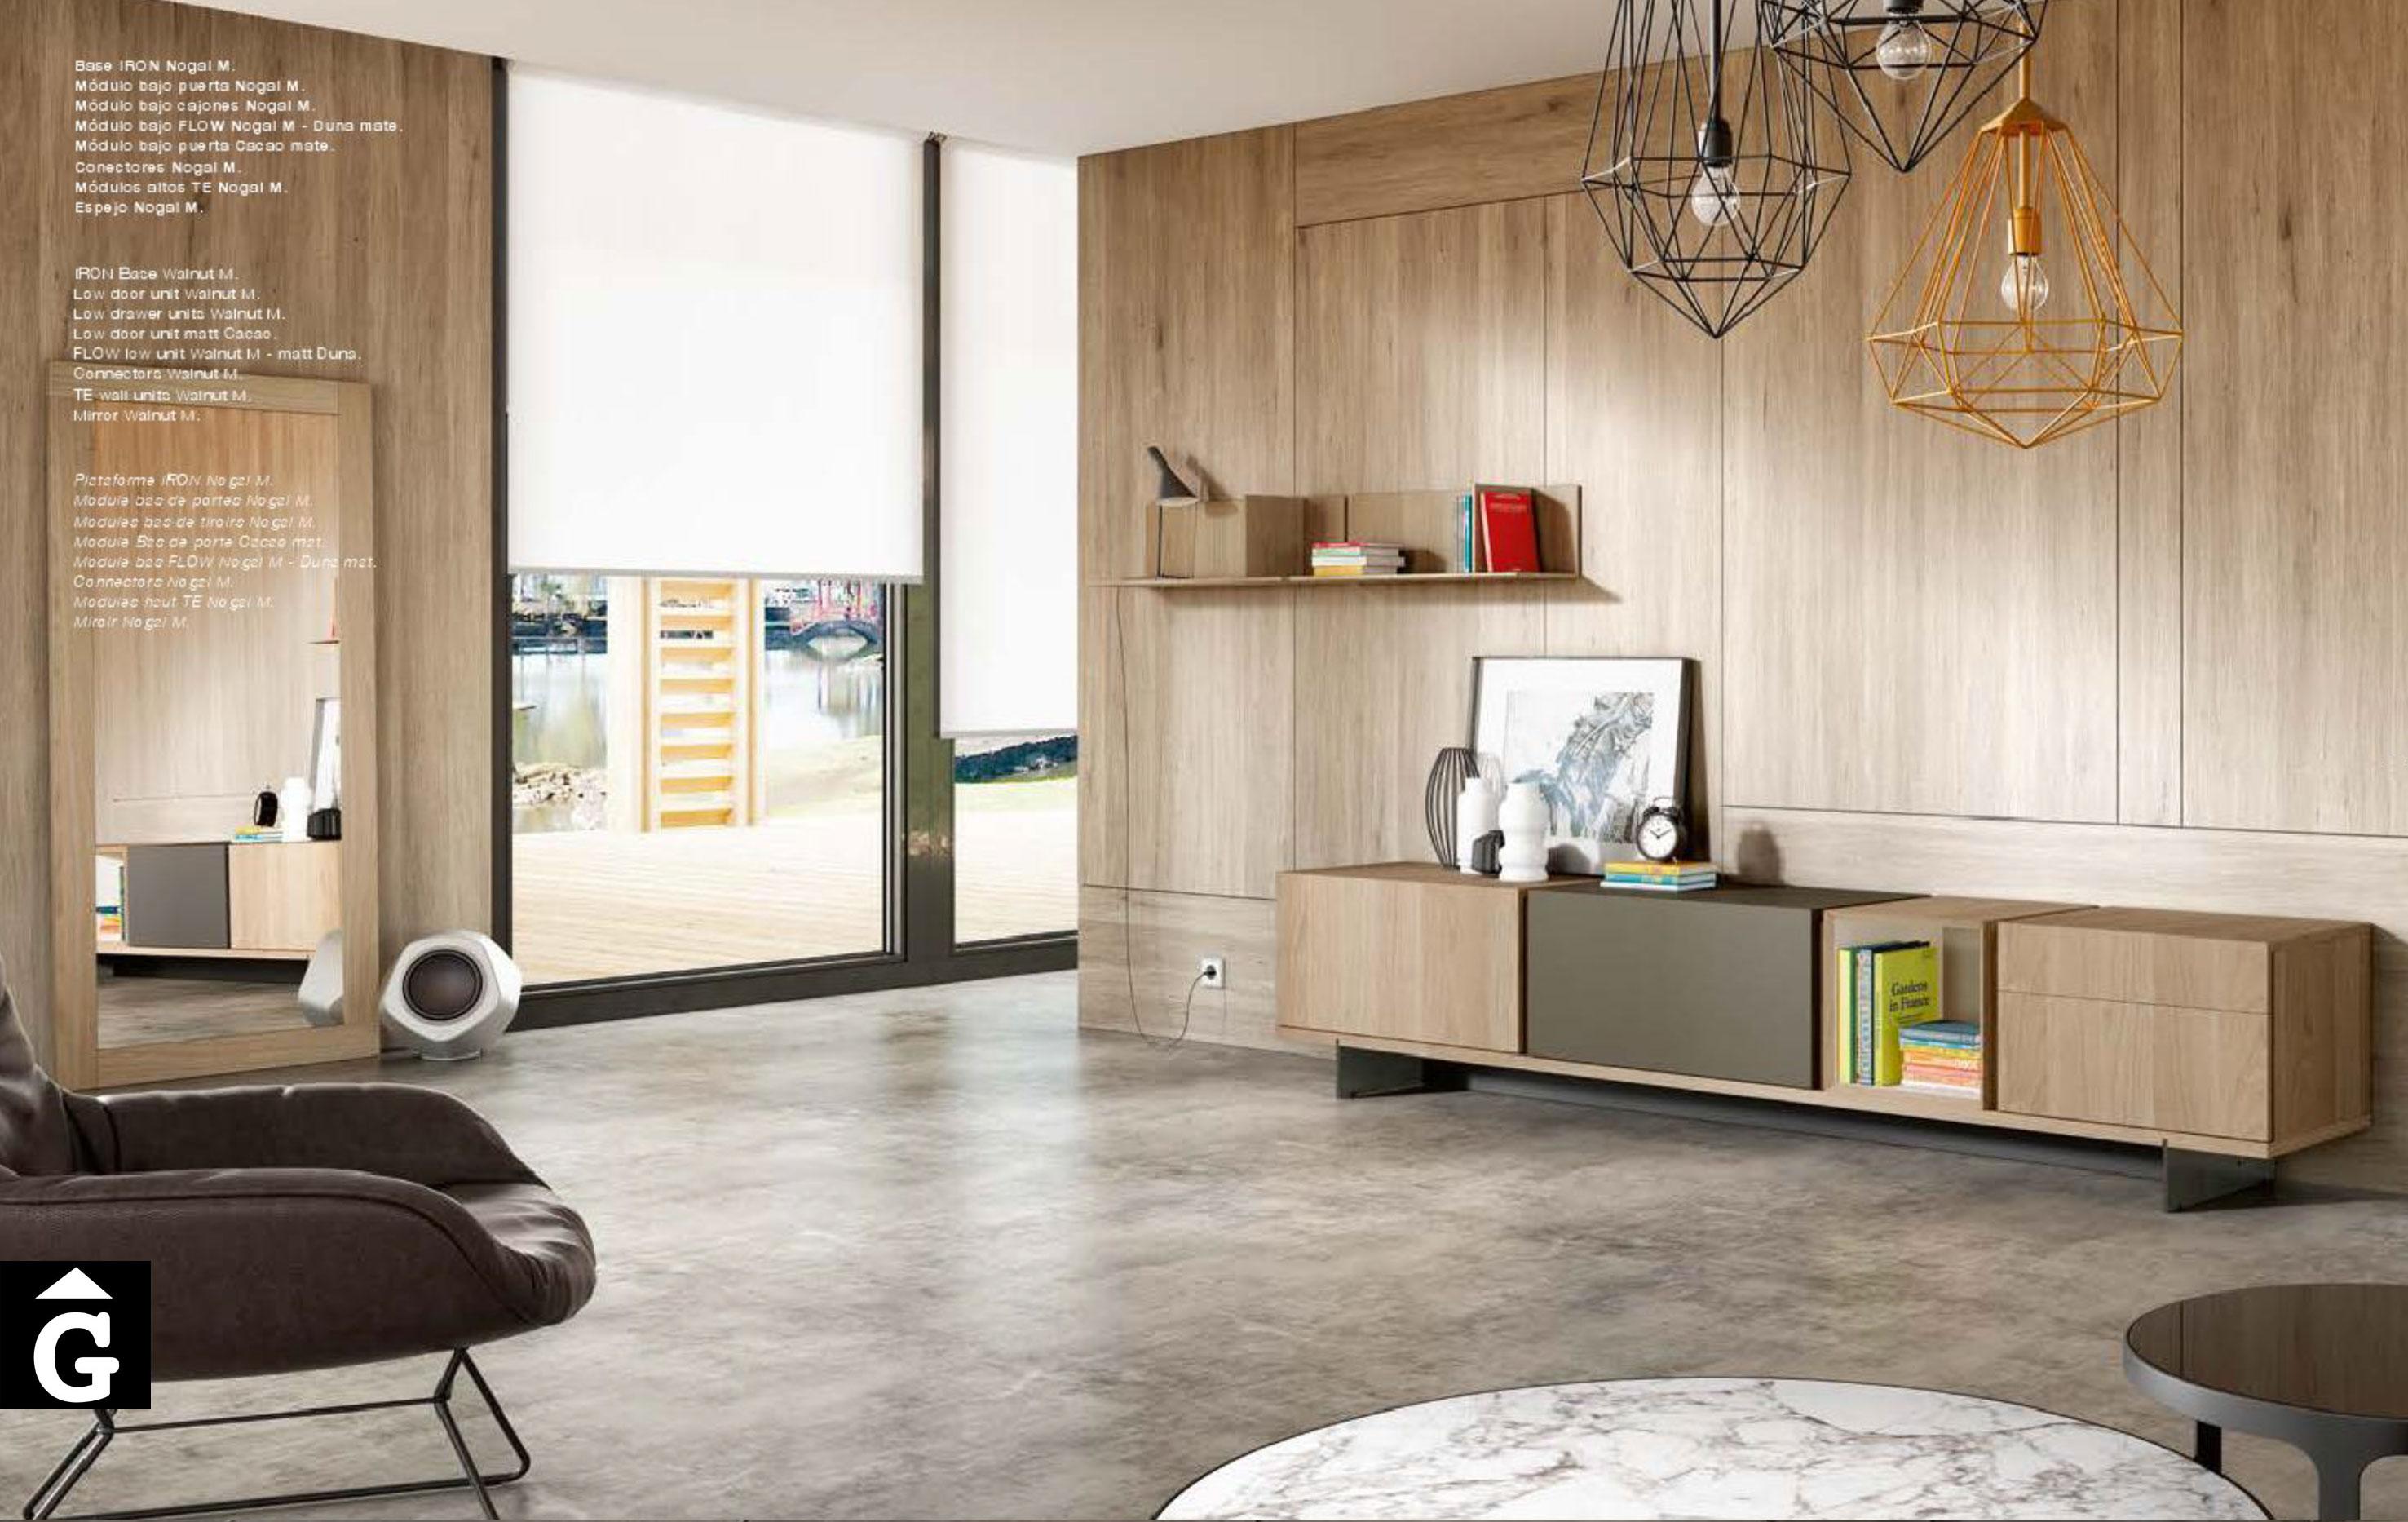 MOBLE-48-CONNECTOR-EMEDE-mobles-by-Mobles-GIFREU-Girona-ESPAI-EMEDE-Epacio-emede-Muebles-MD-moble-menjador-Sala-estar-habitatge-qualitat-laca-xapa-natural